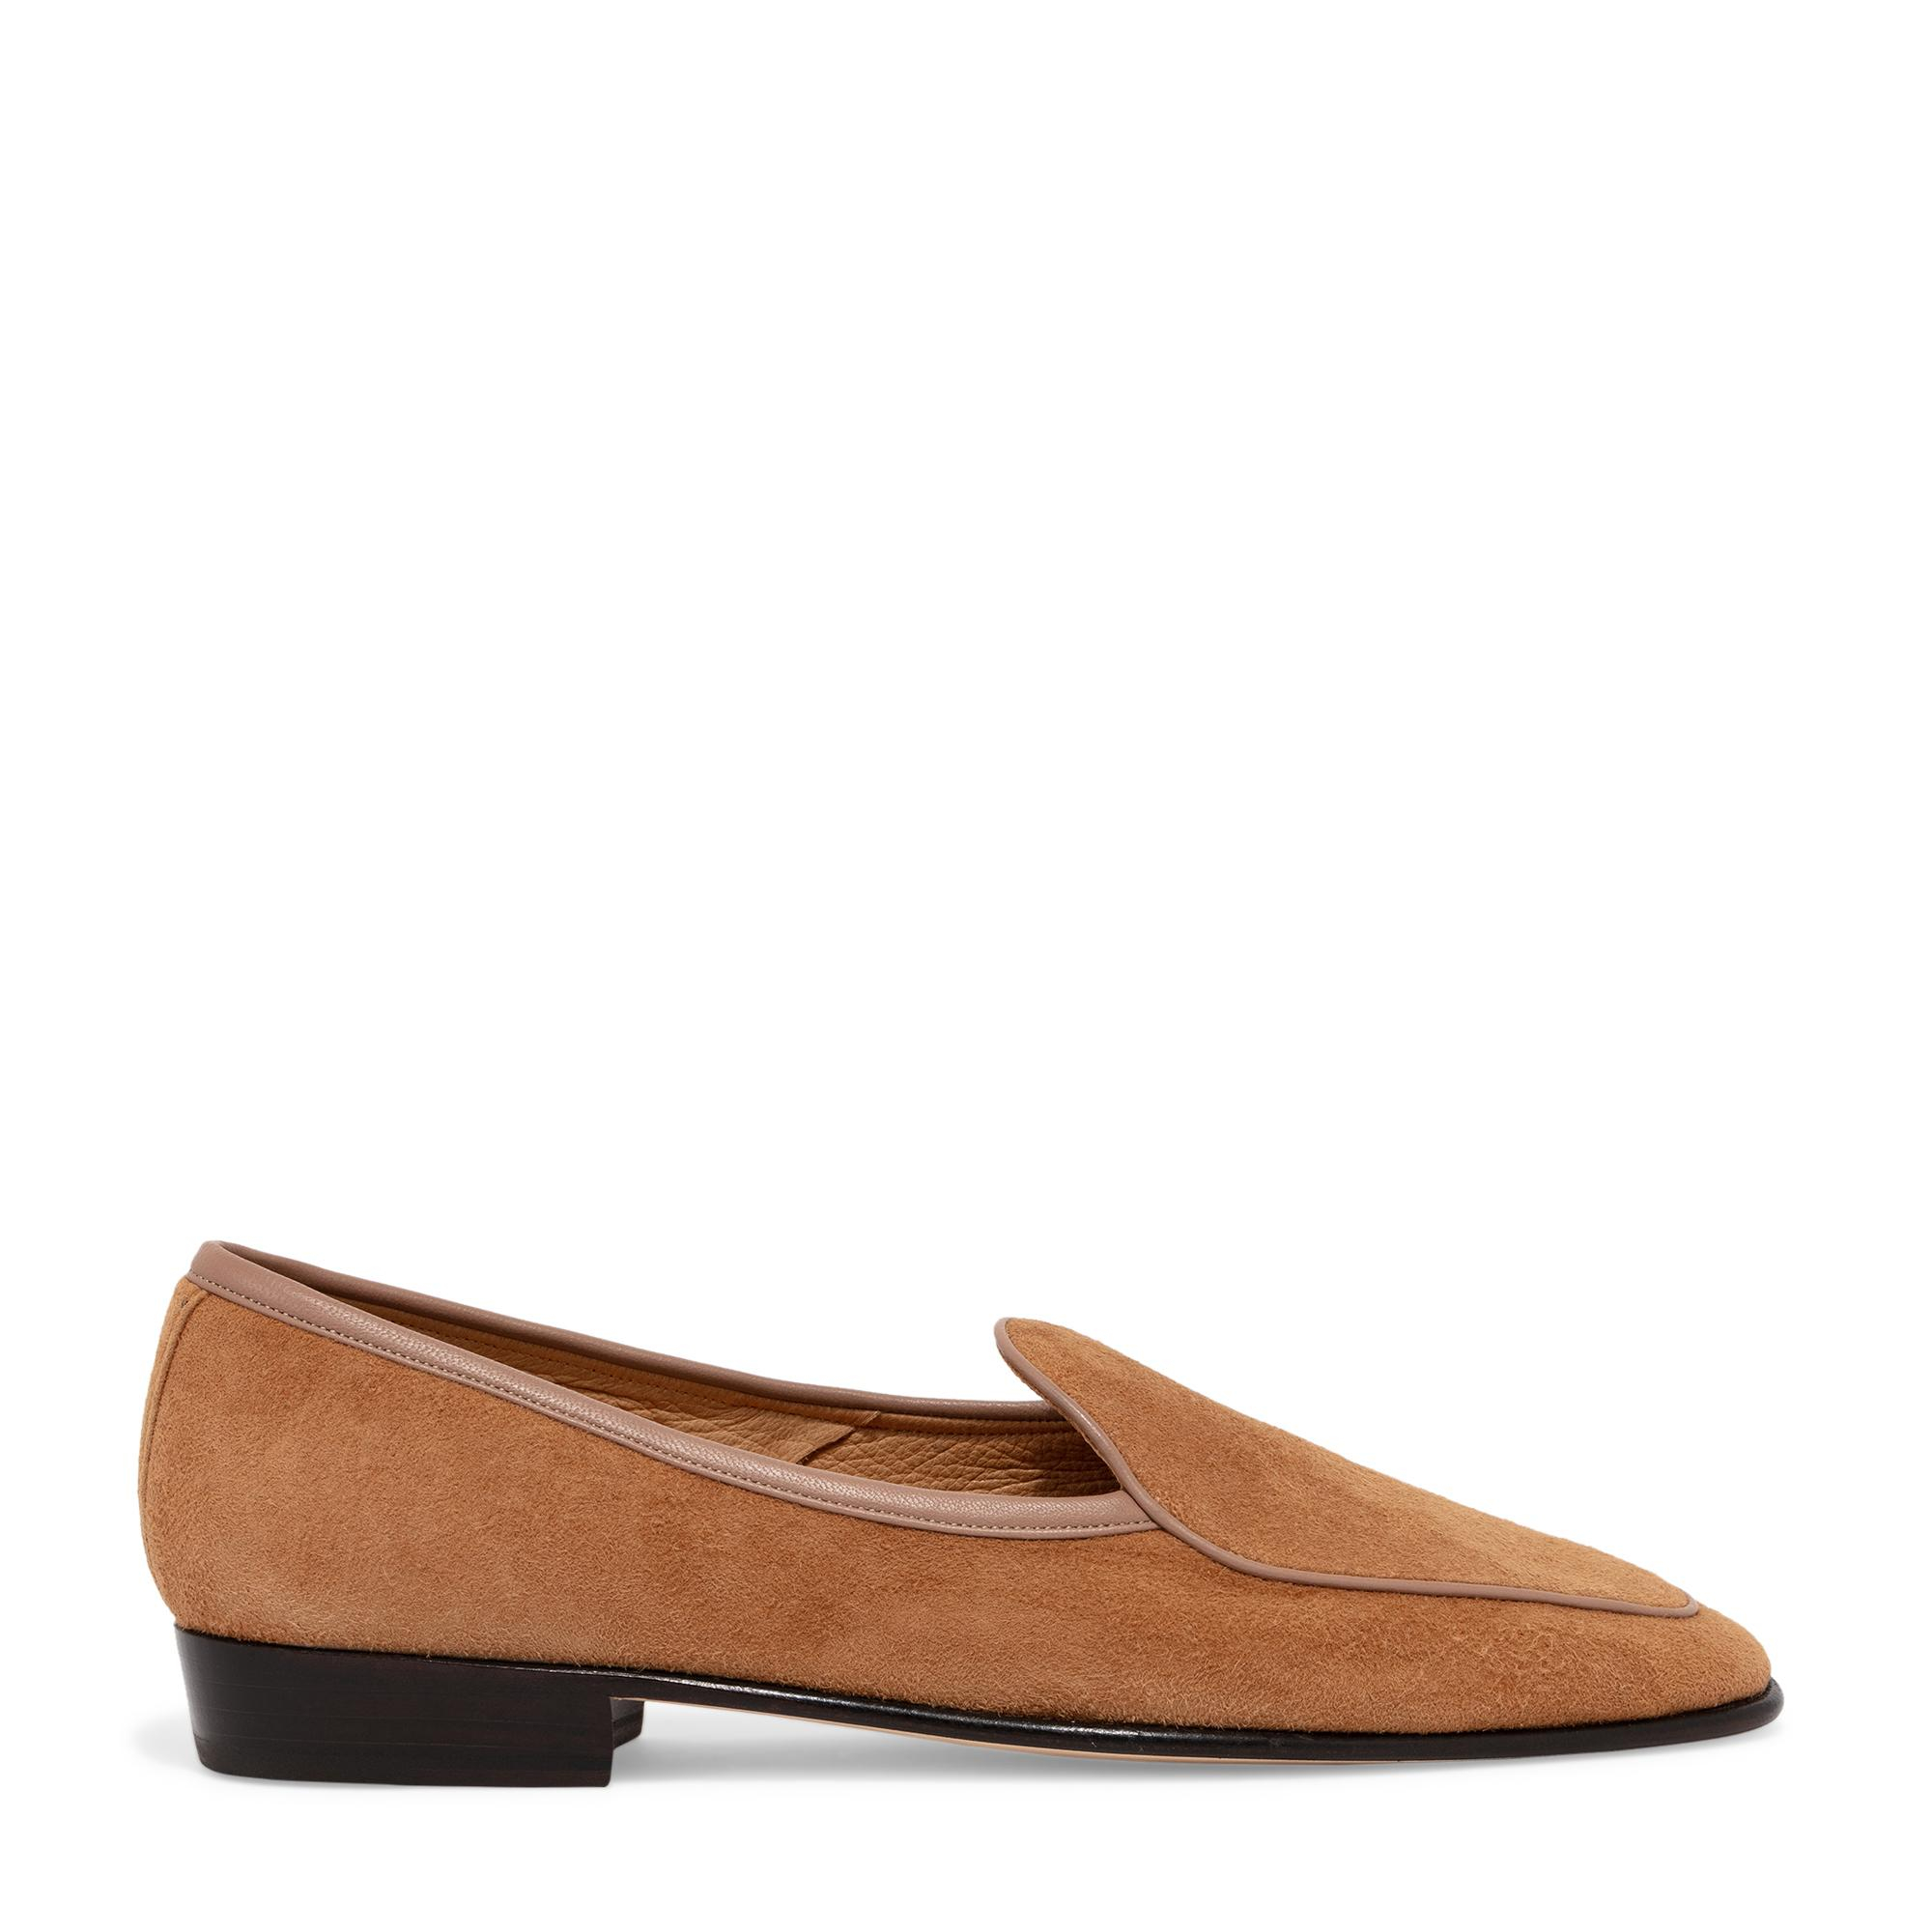 Sagan Classic loafers